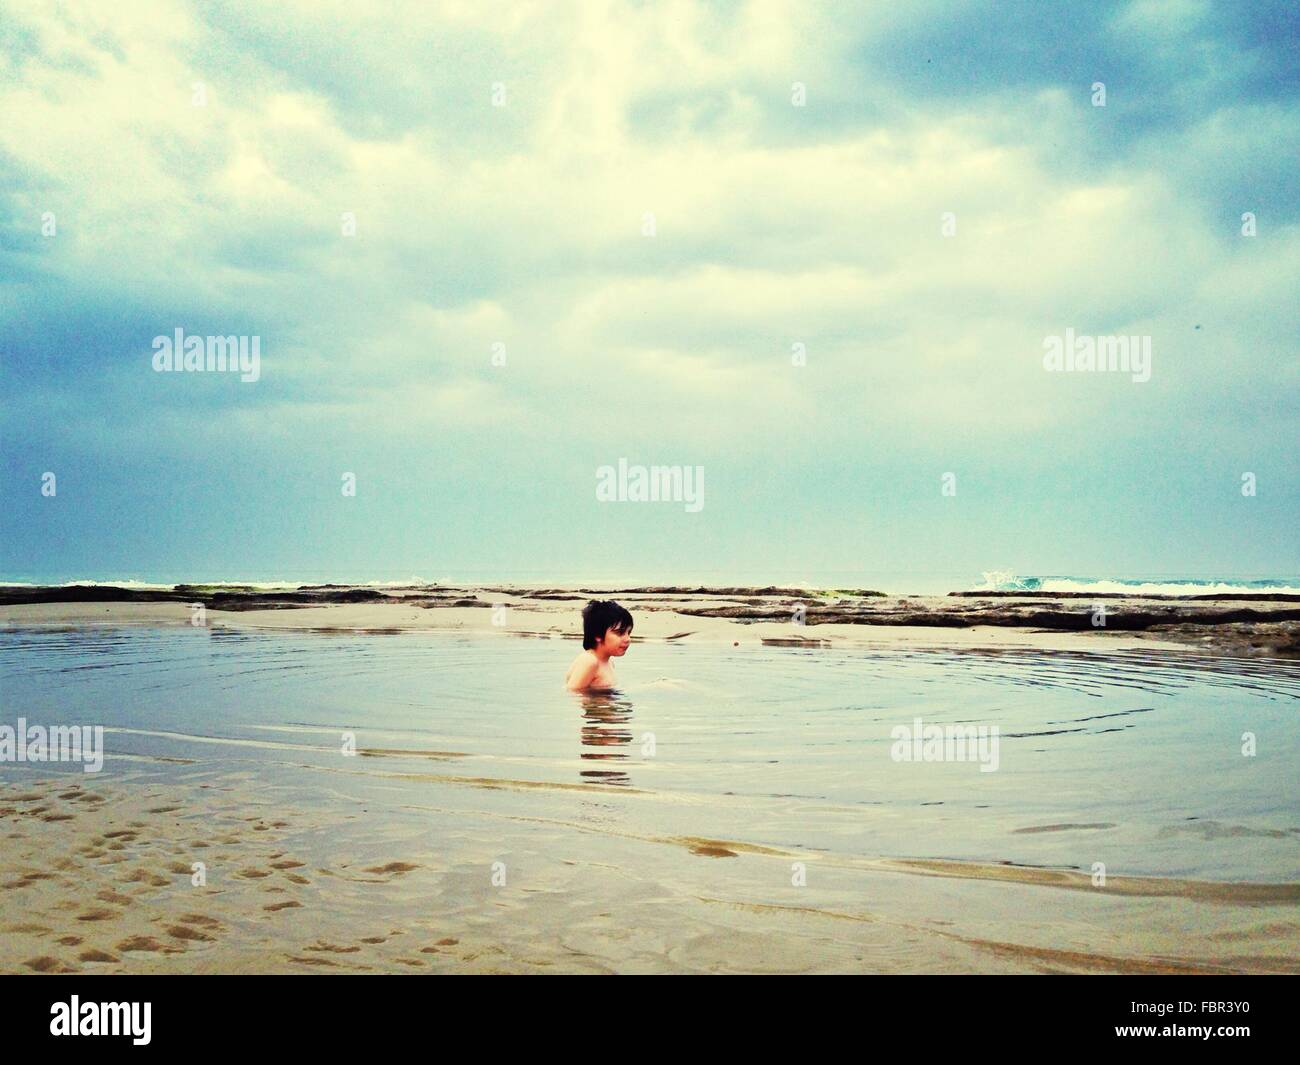 Shirtless jungen Schwimmen im Meer Stockbild